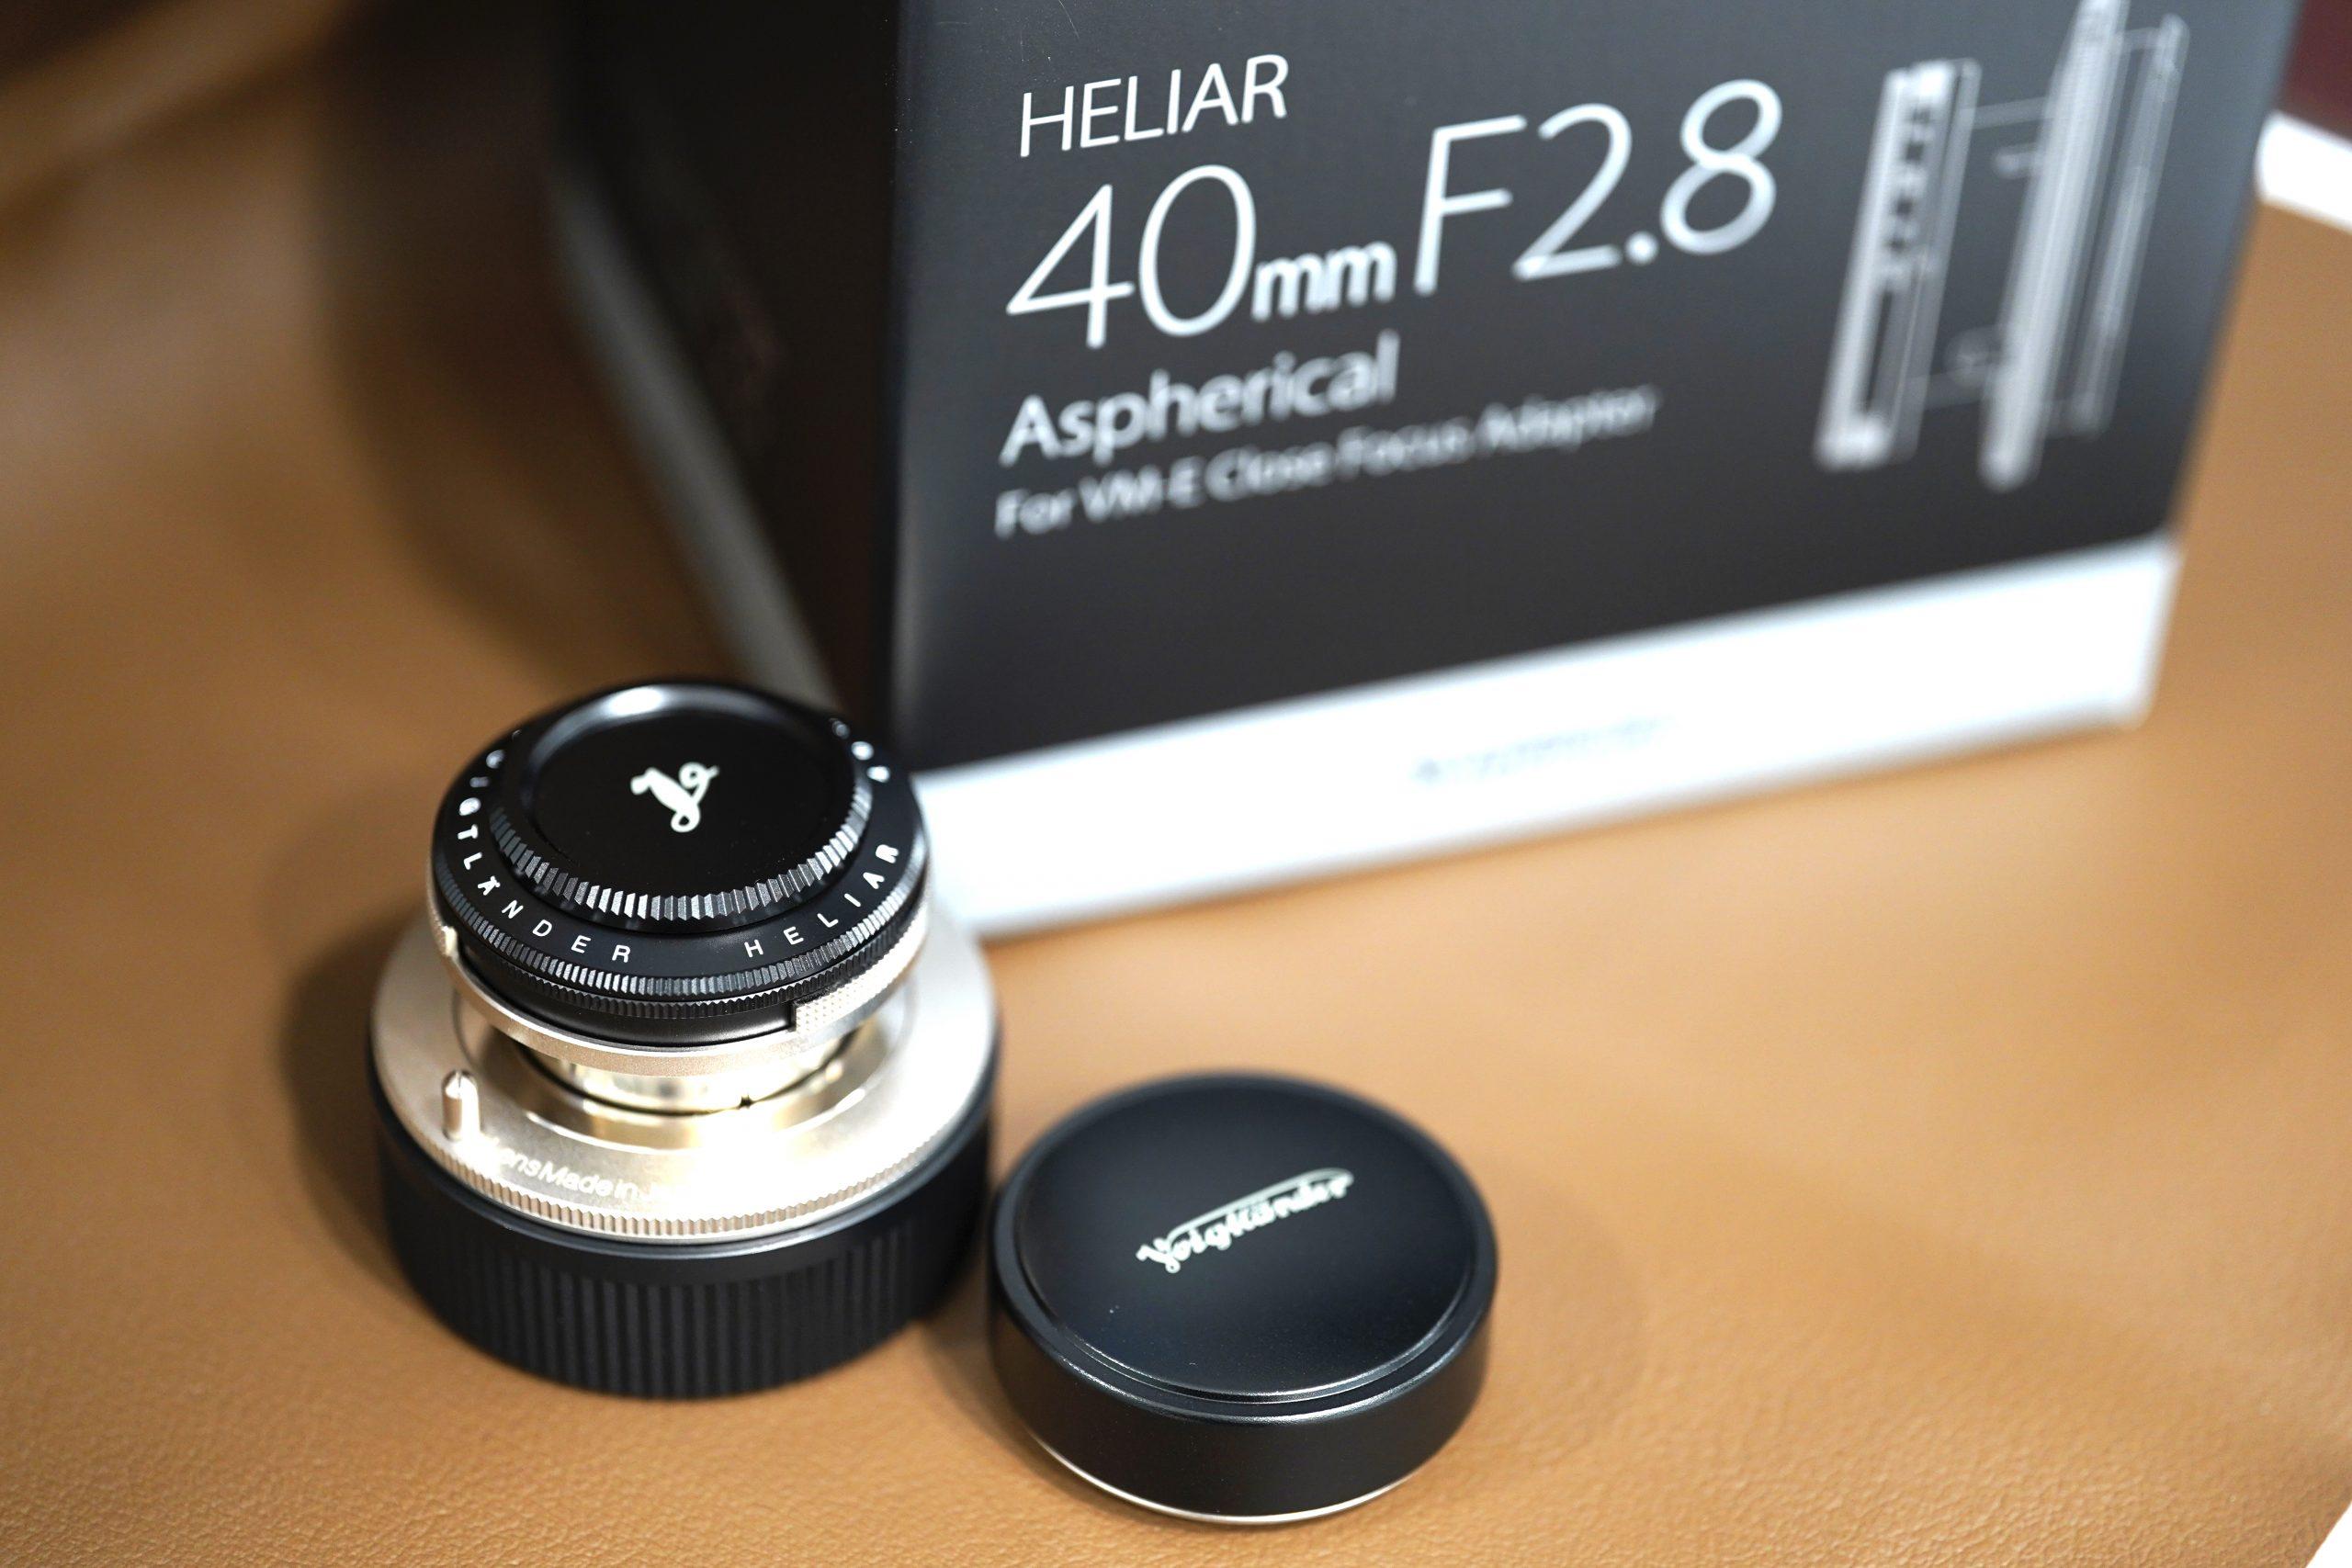 Camera Technique Vol.24『HELIAR 40mm F2.8 VM』とは?